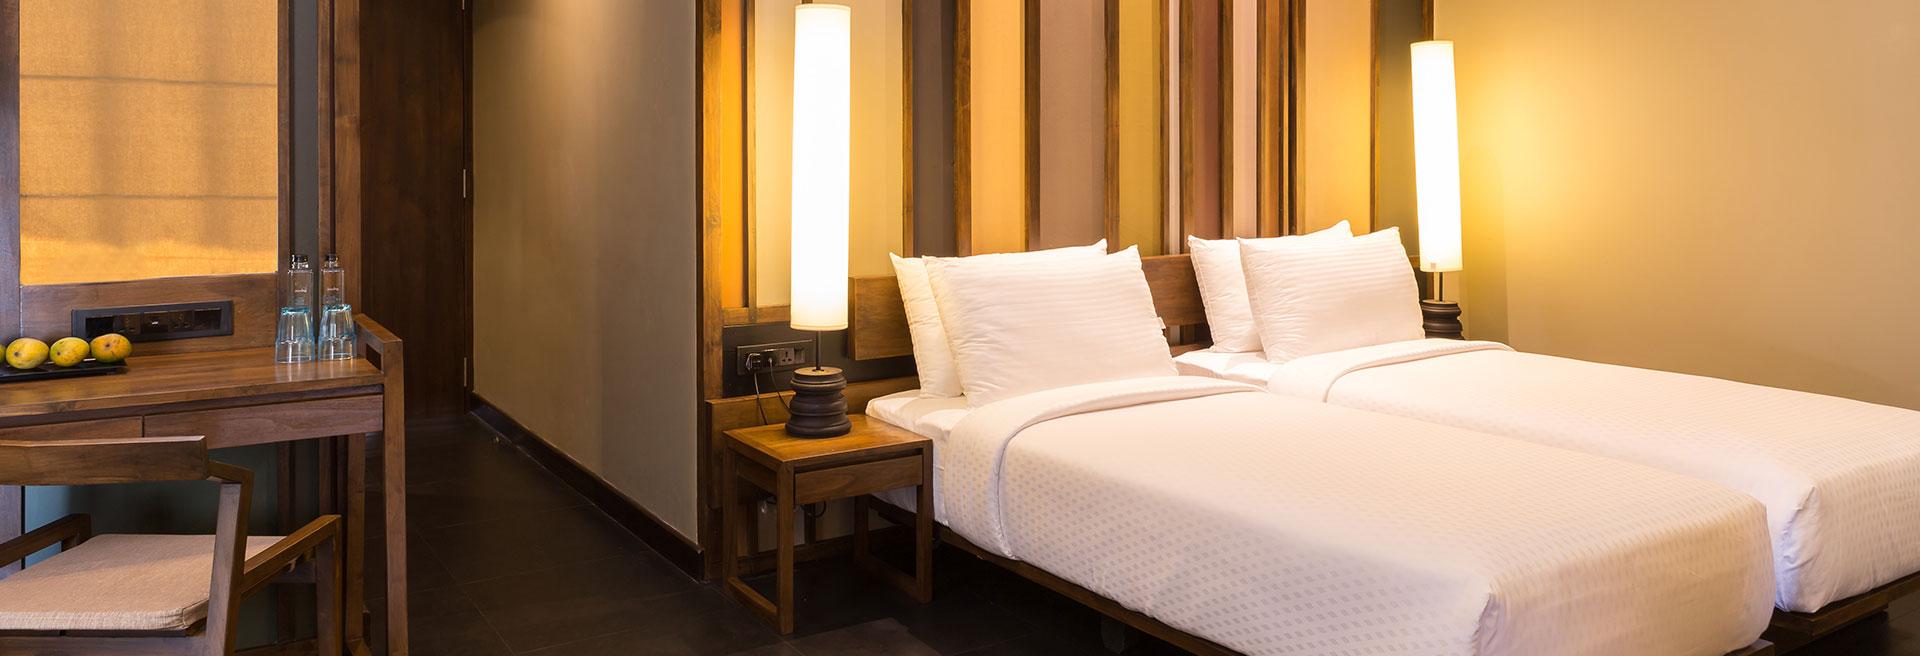 Accommodation in Dambulla